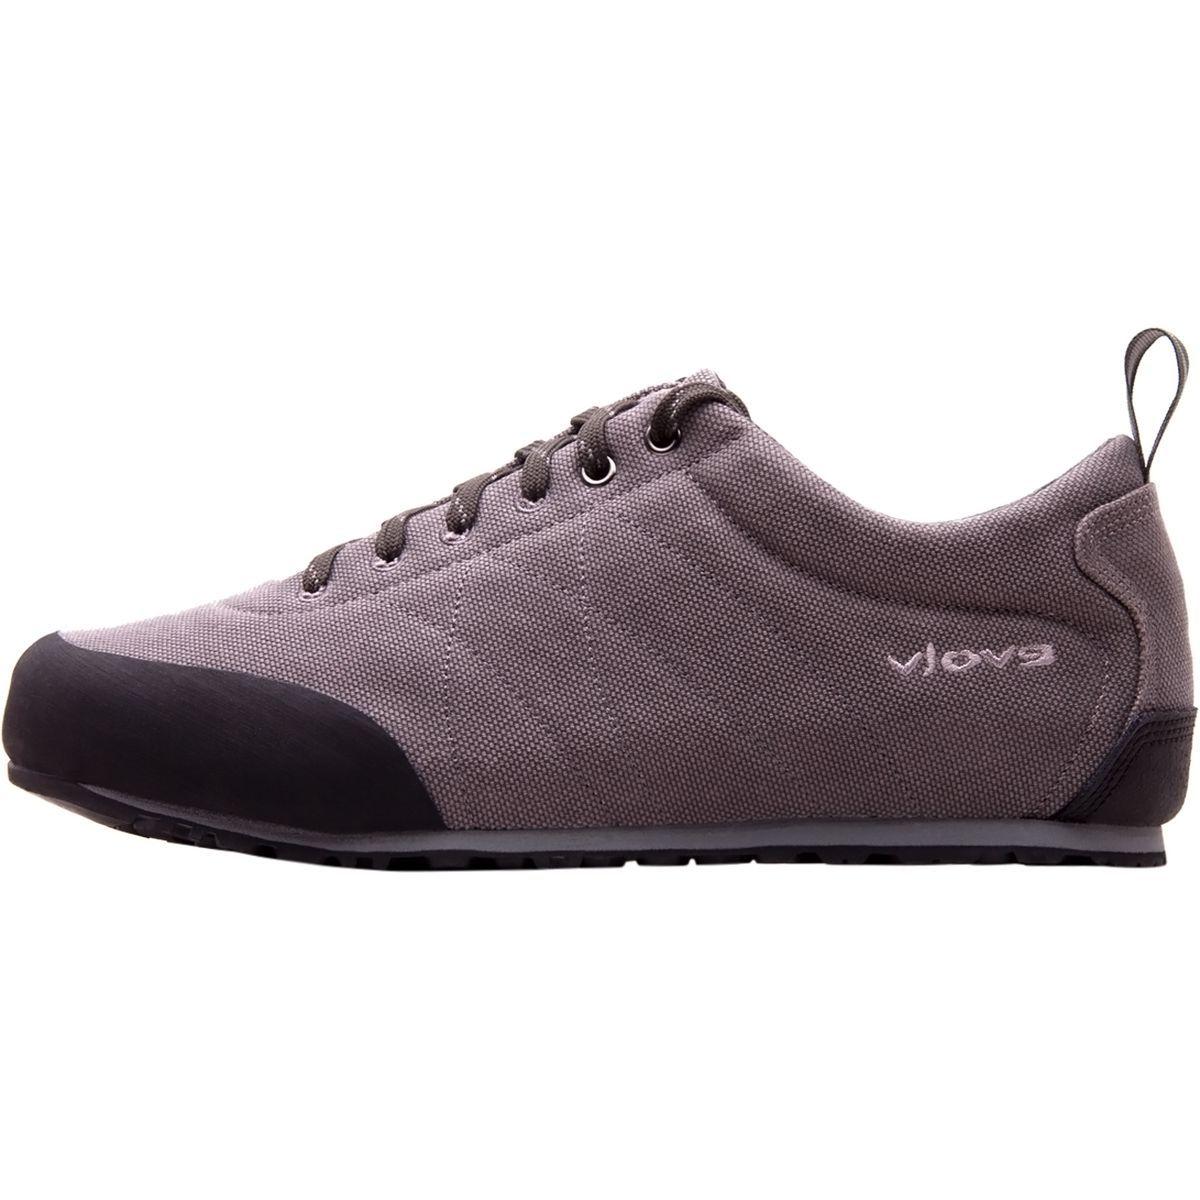 Evolv Cruzer Psyche Approach Shoe - Men's